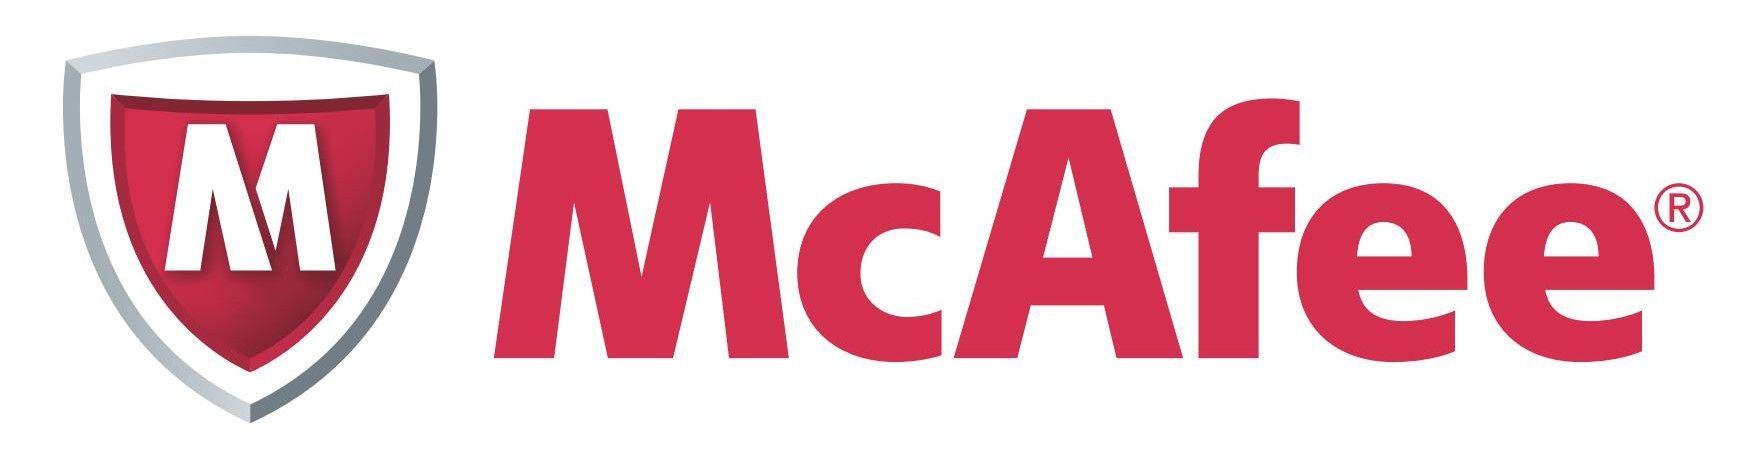 mcafee-logo | LogoMania | Mobile security, Security solutions